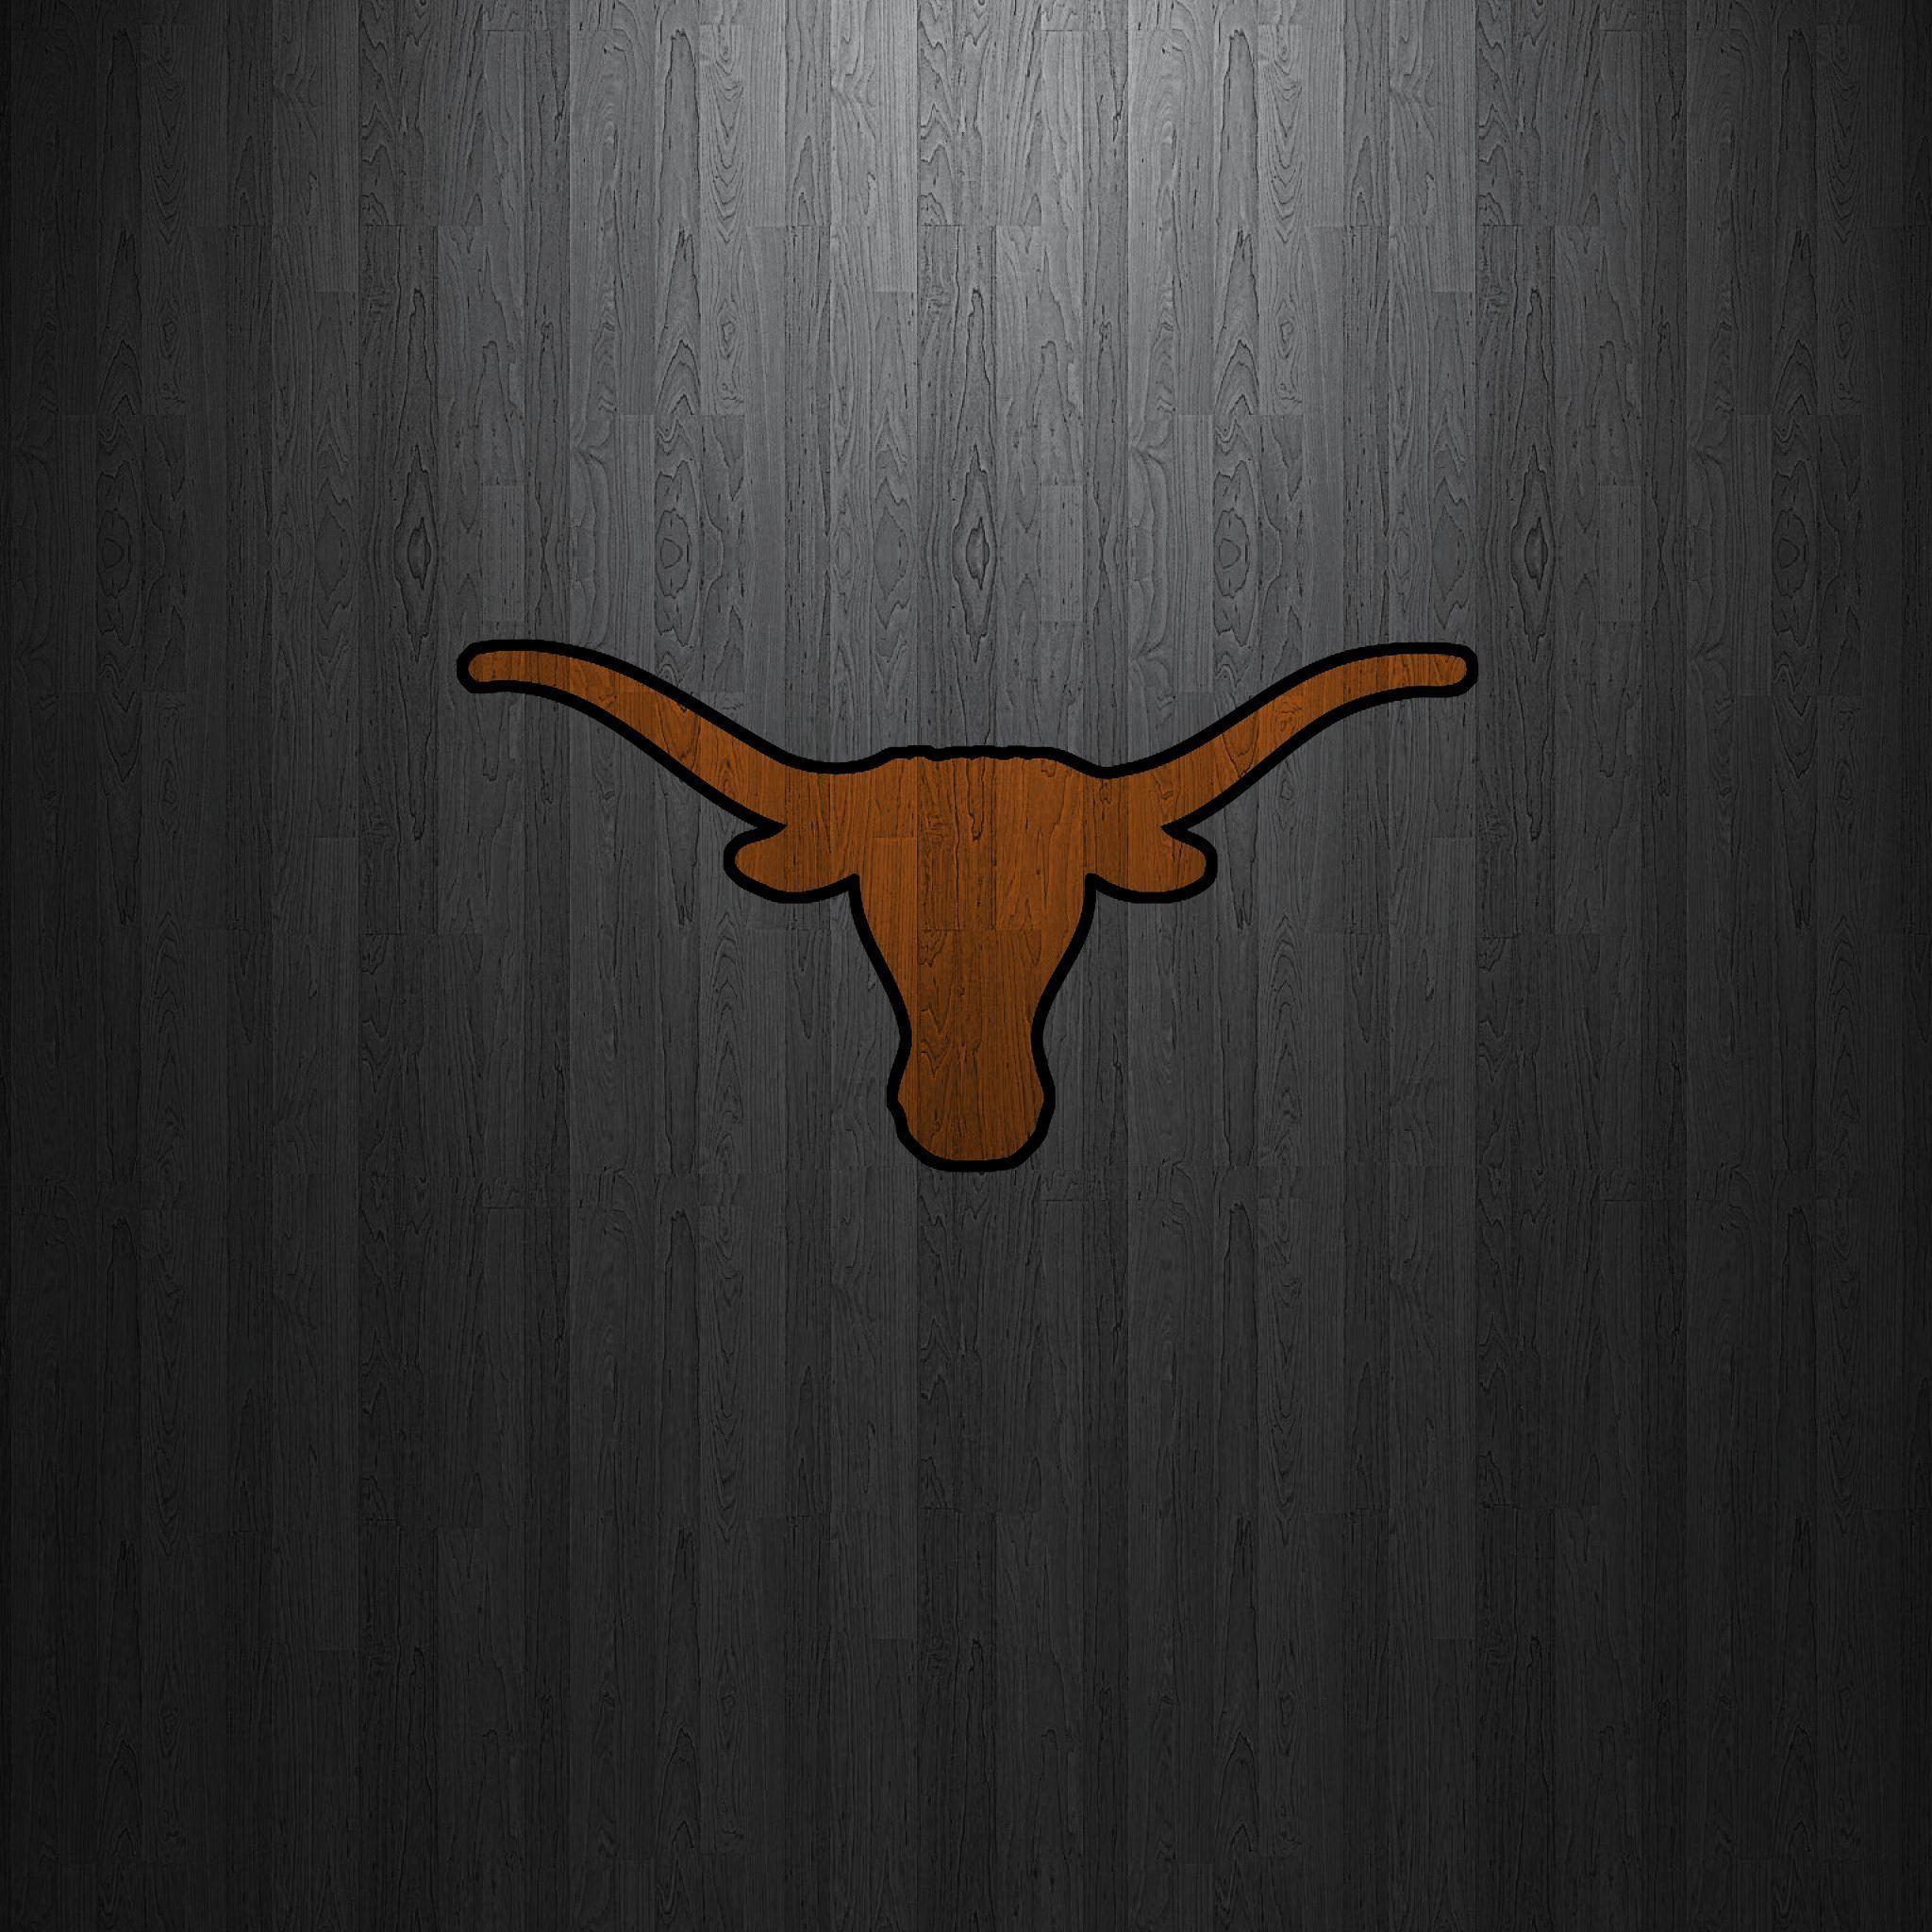 Texas Rangers Wallpapers HD | PixelsTalk.Net